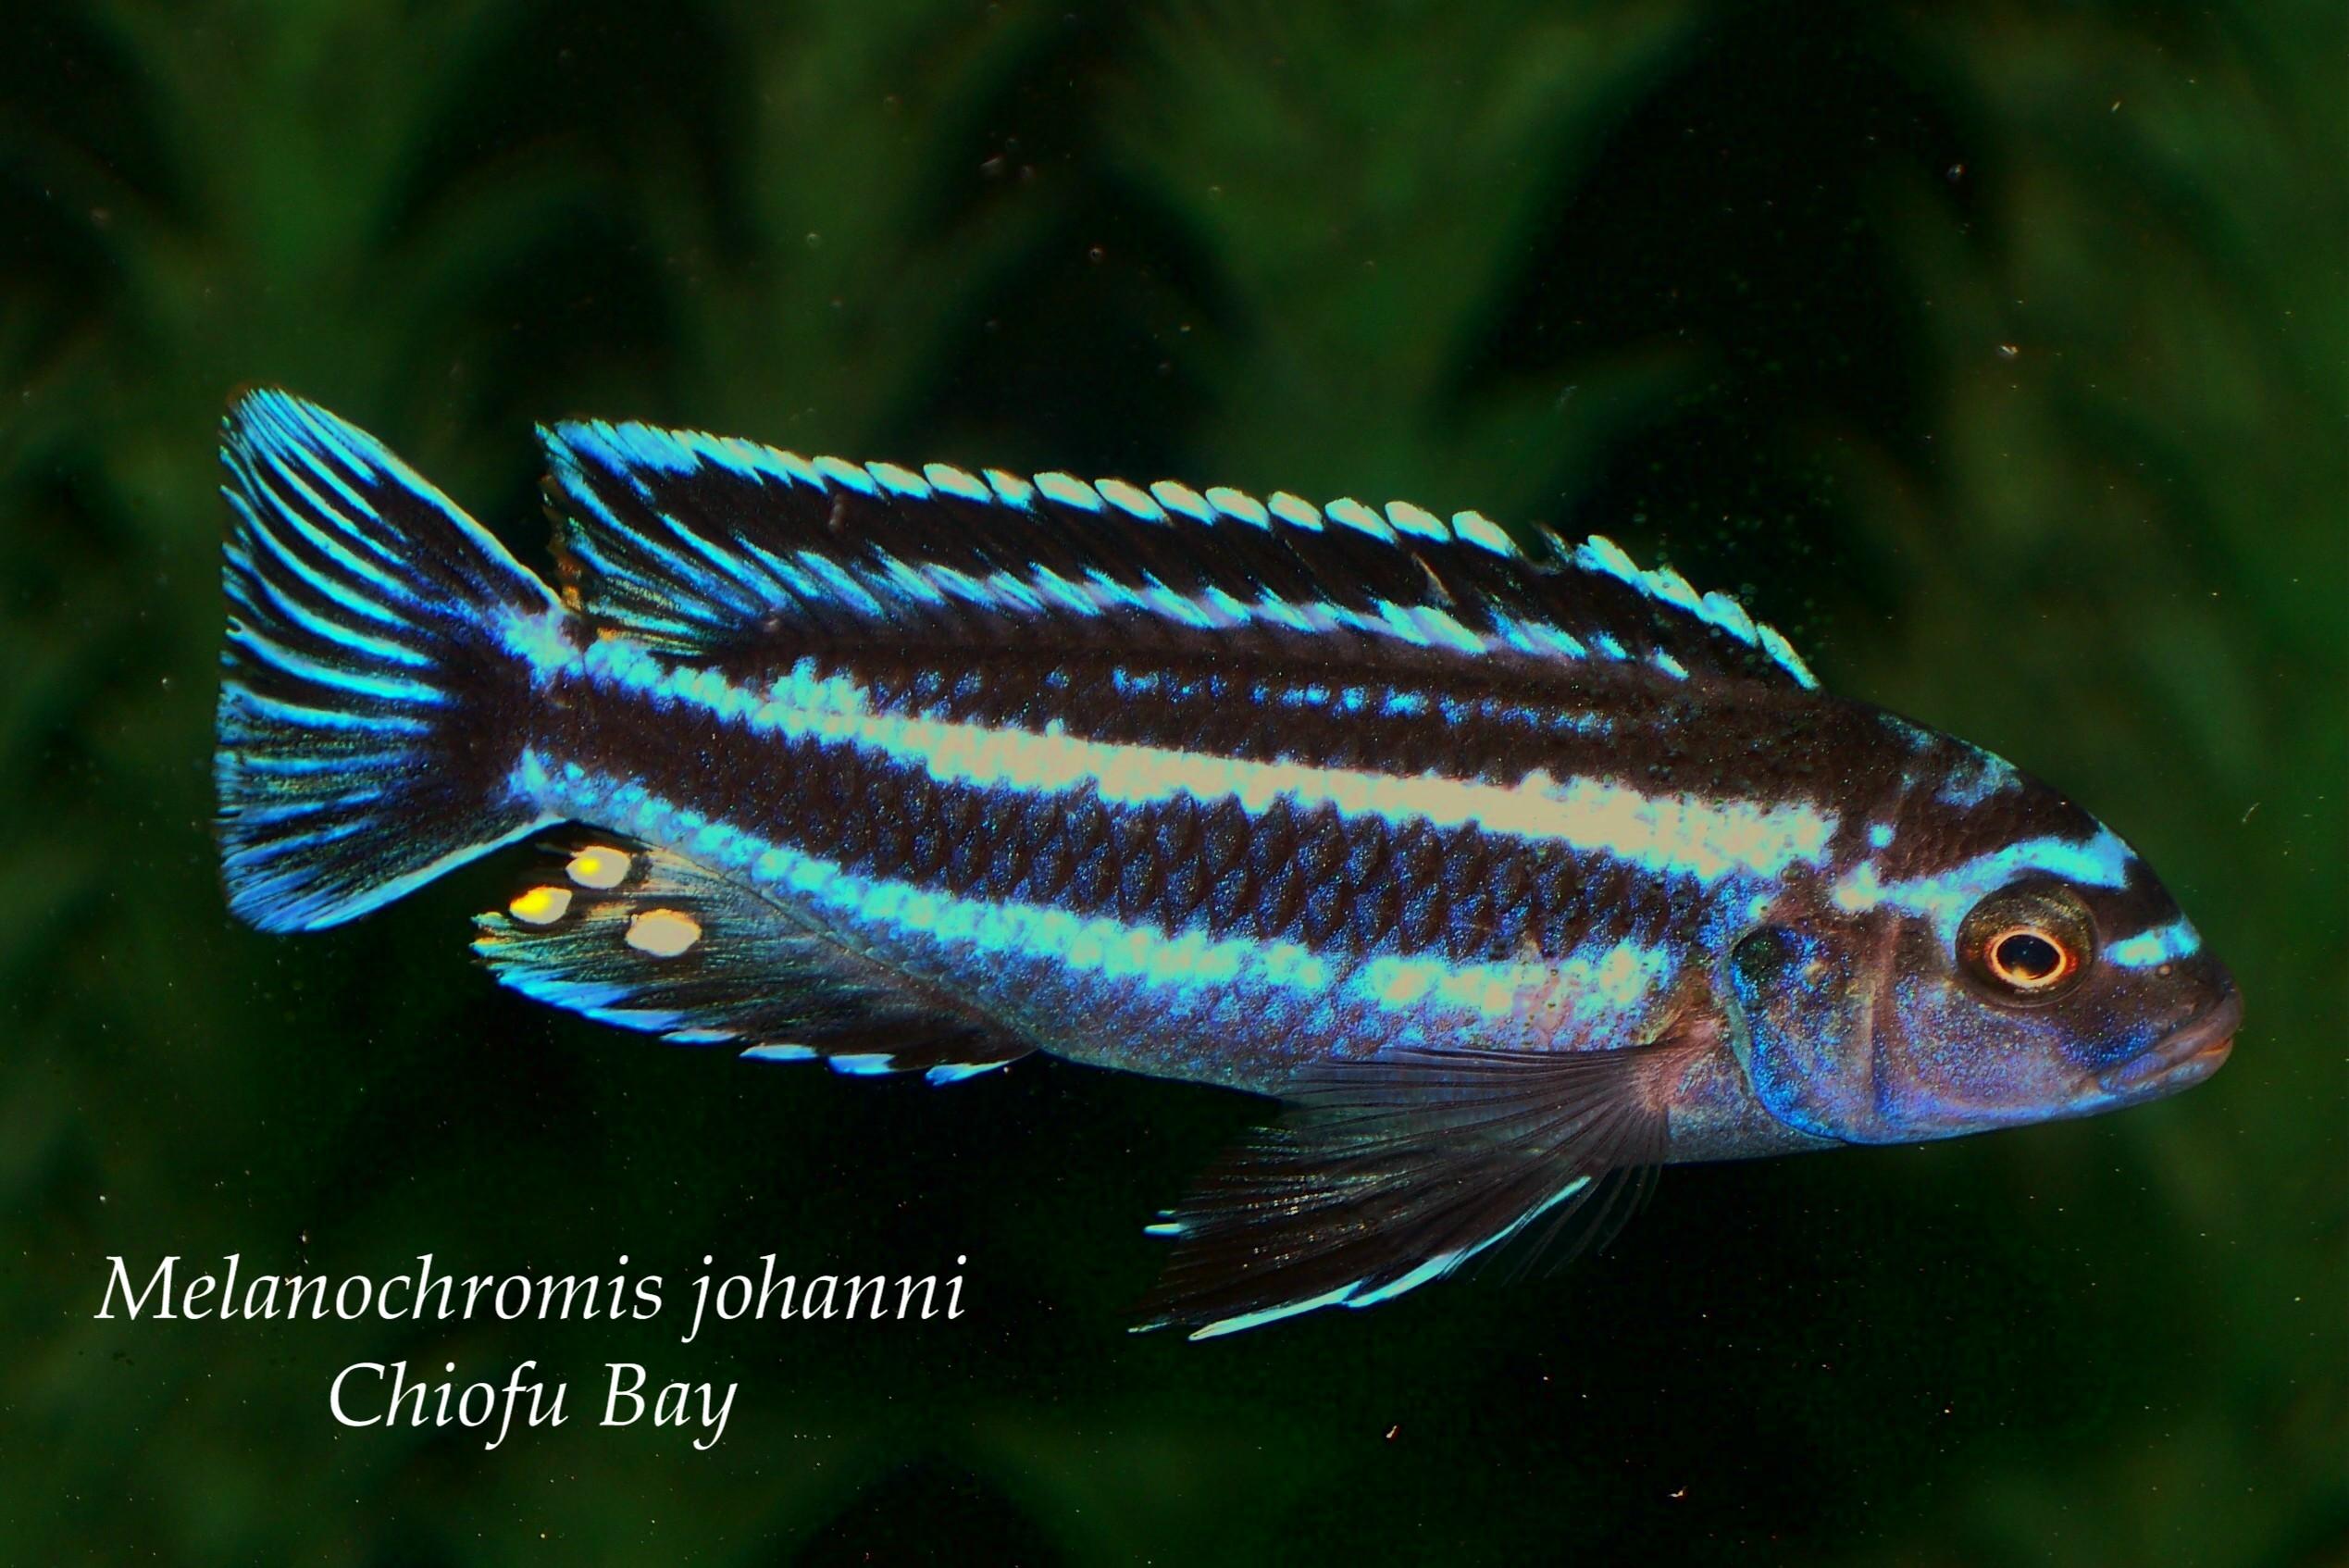 cichlids.com: F1 Melanochromis johanni Chiofu Bay